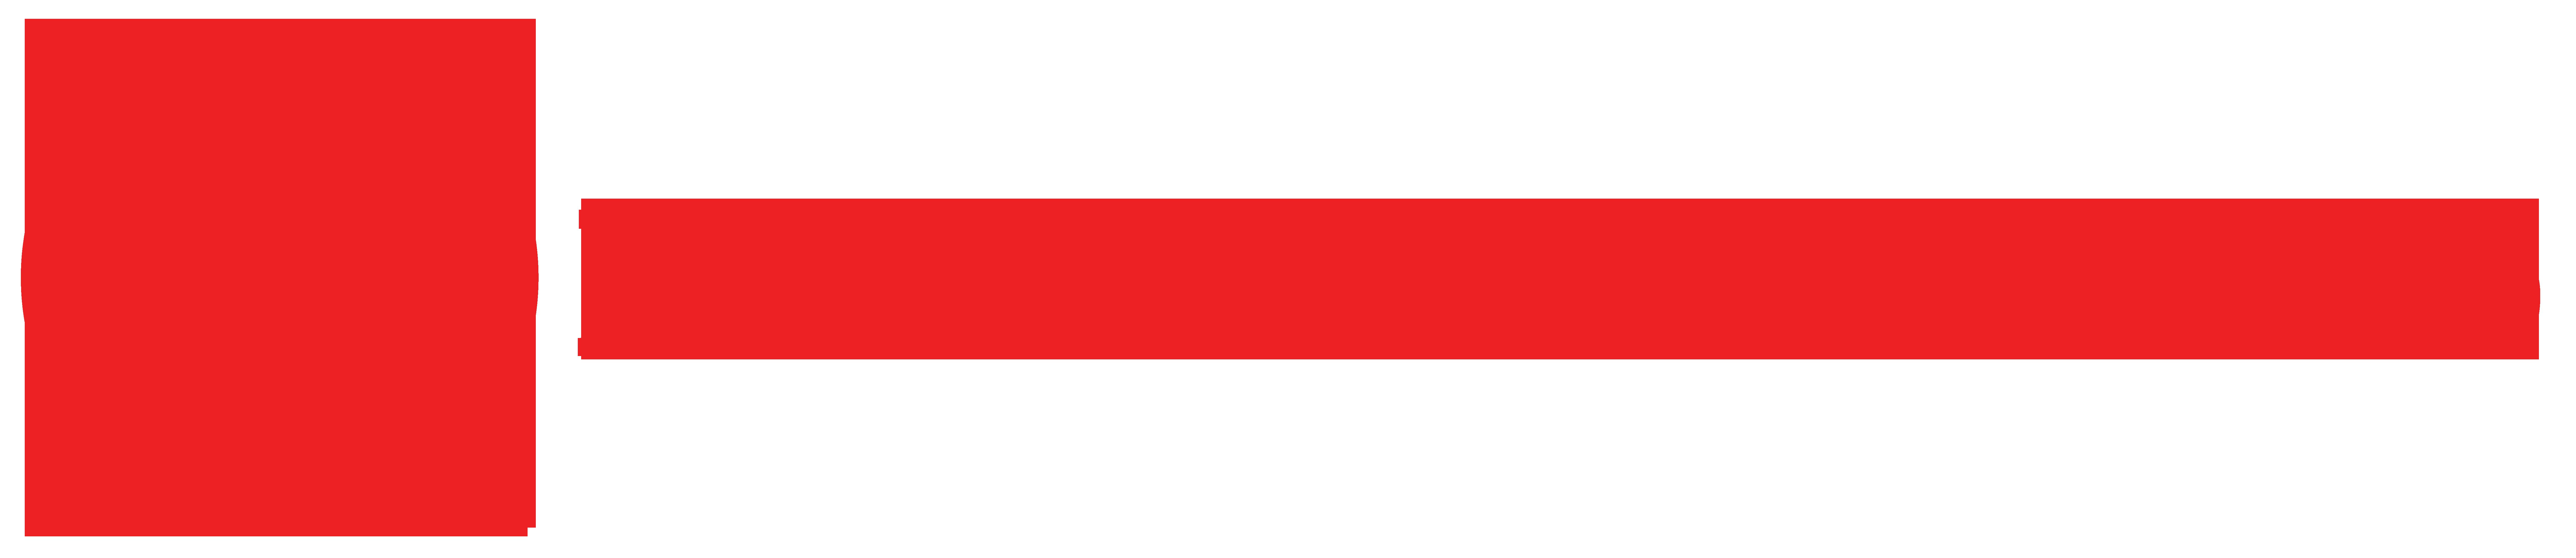 Find a Delaware Job